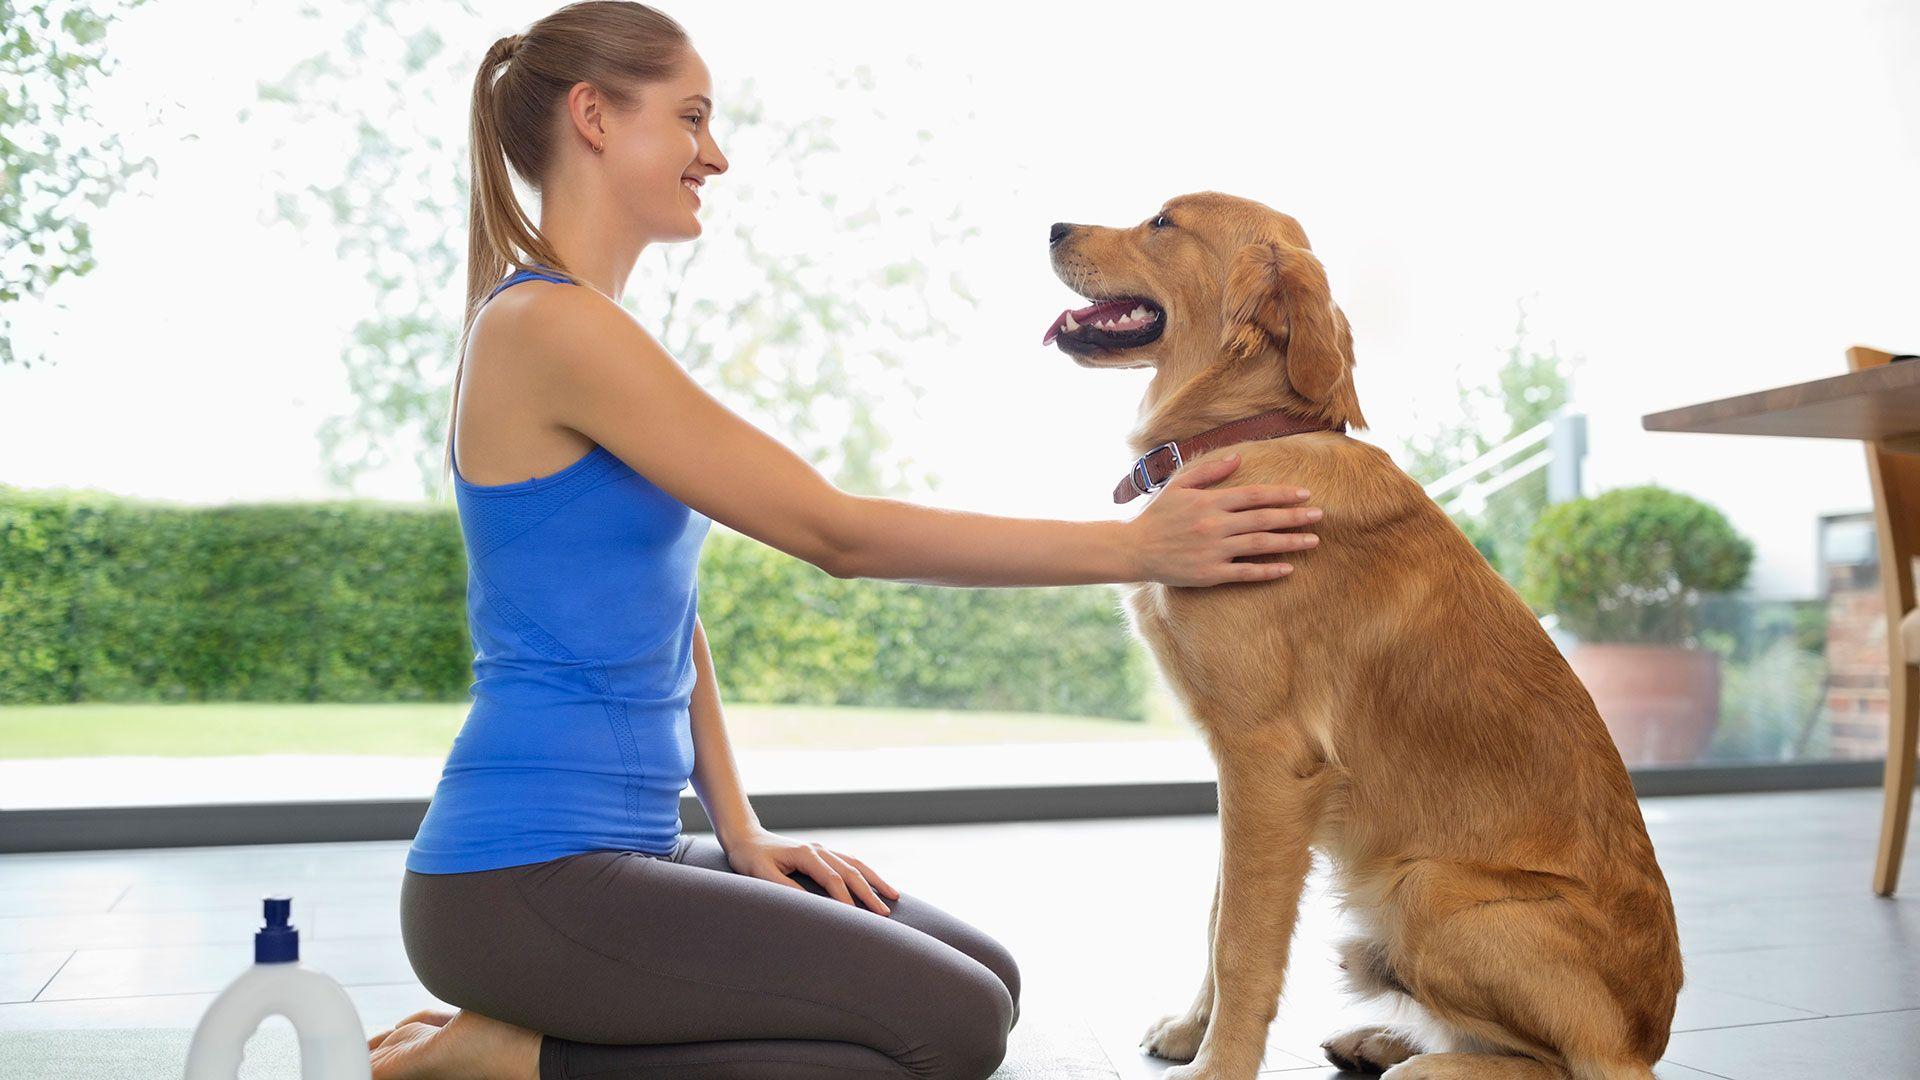 woman in yoga clothing petting dog